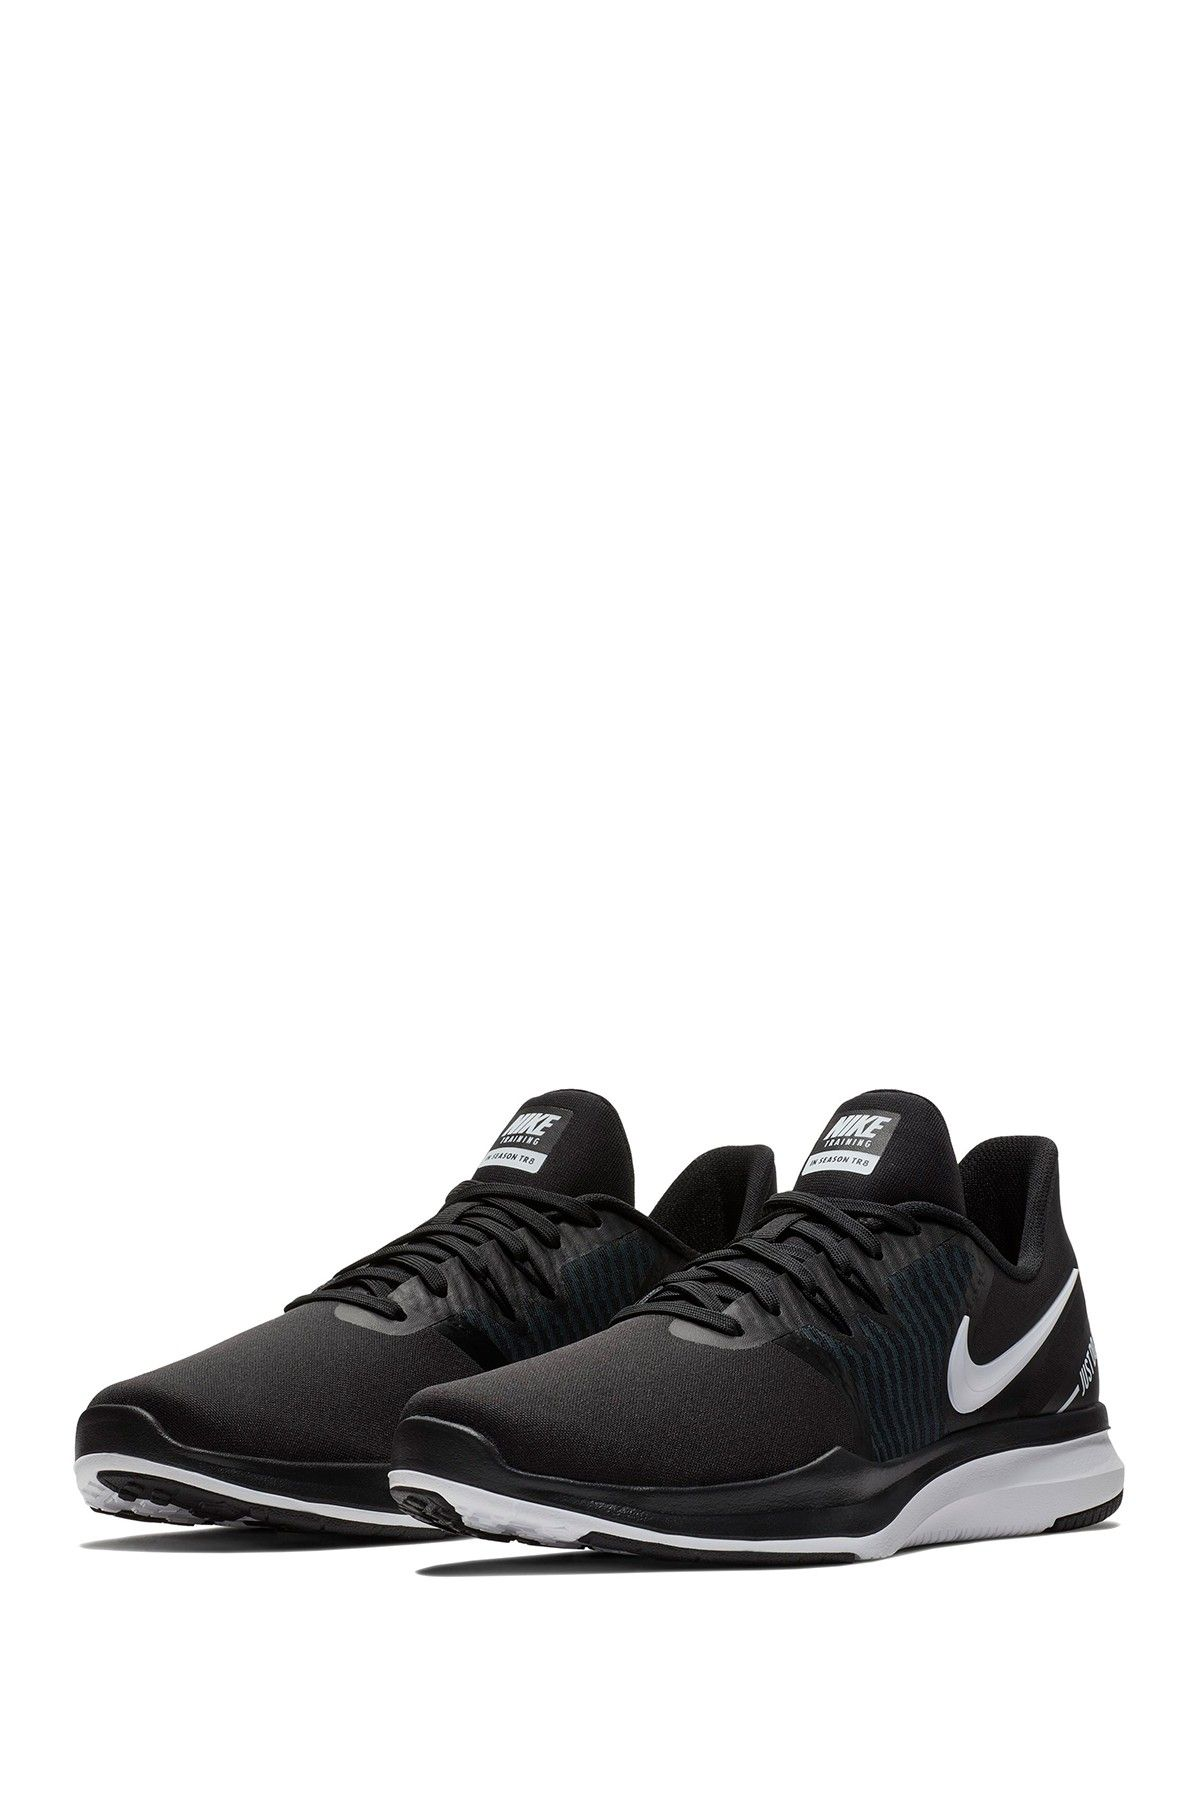 2f16a6a7e9e Image of Nike In-Season Training Sneaker